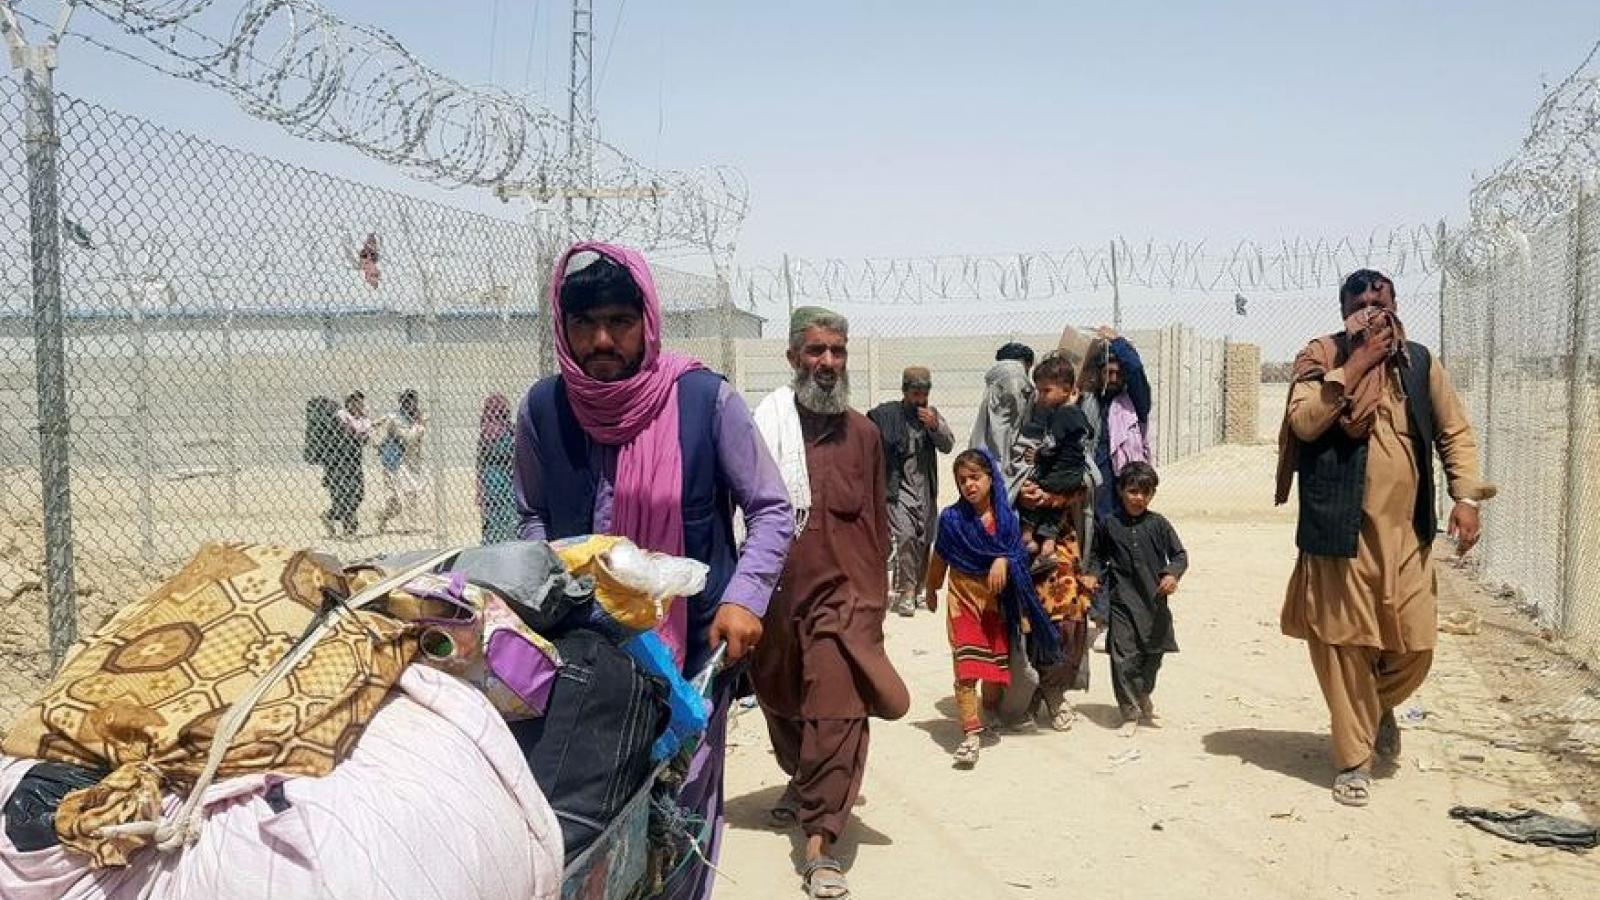 Mỹ cam kết hỗ trợ 64 triệu USD cho Afghanistan